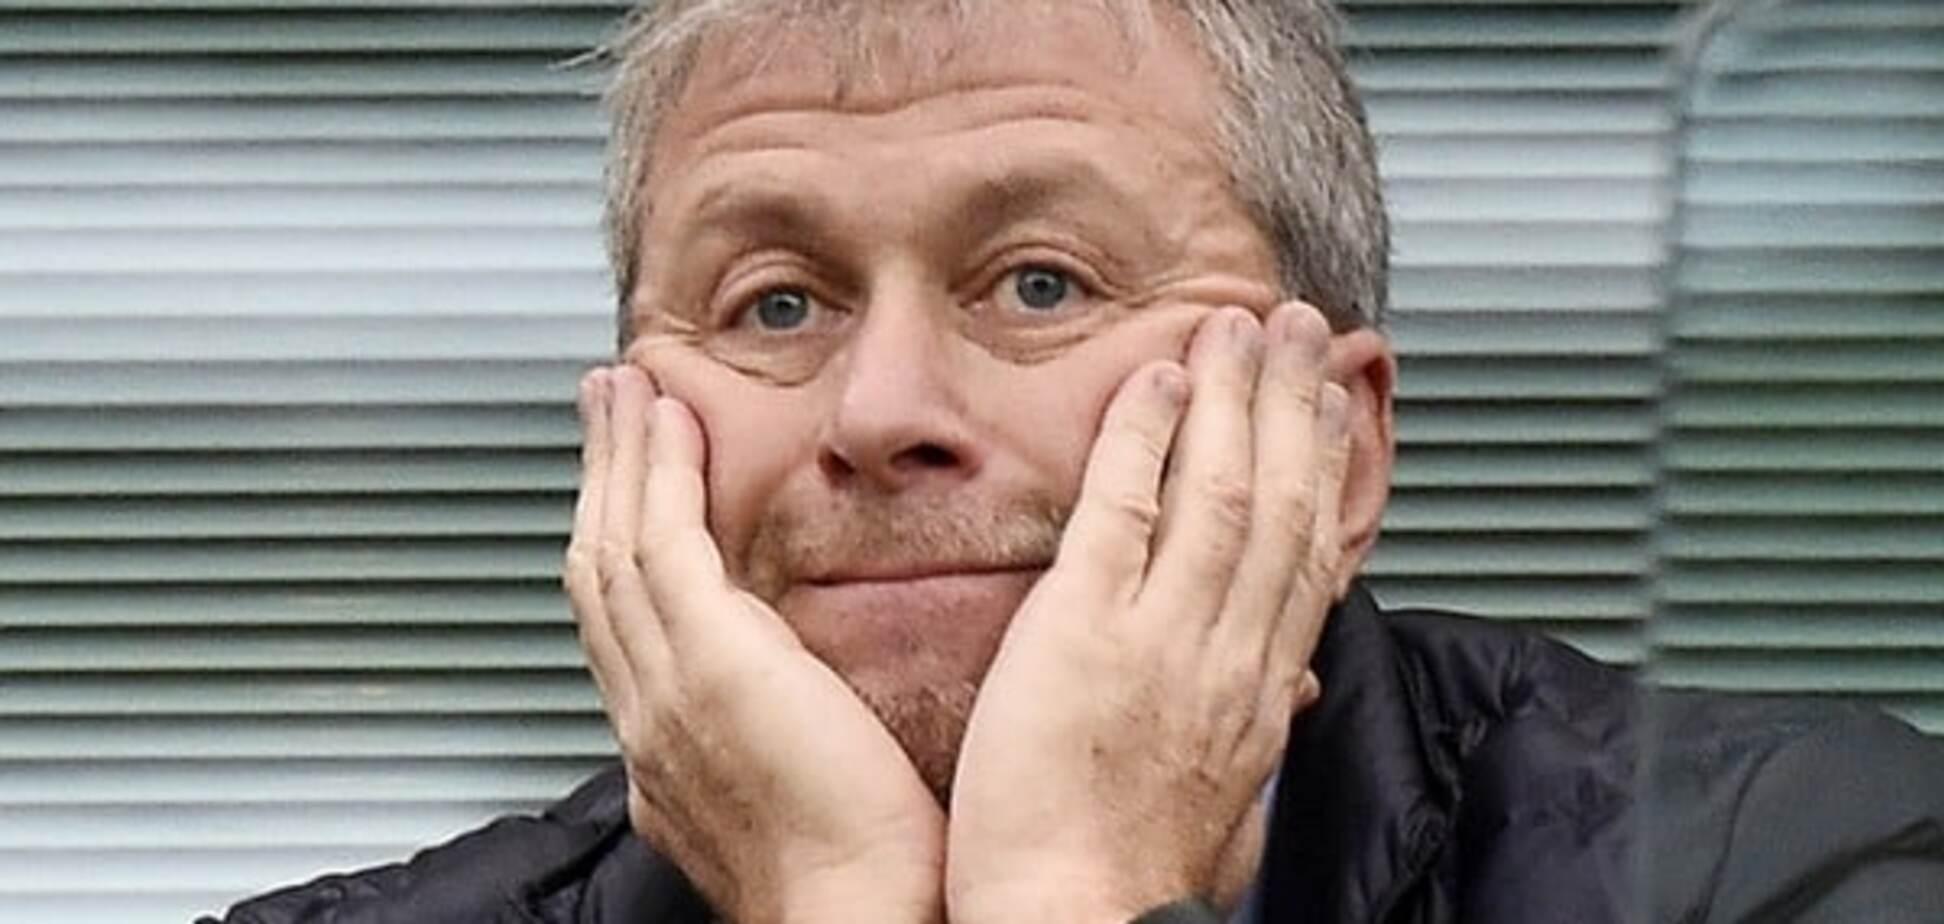 Абрамович разбушевался: в 'Челси' возник громкий скандал